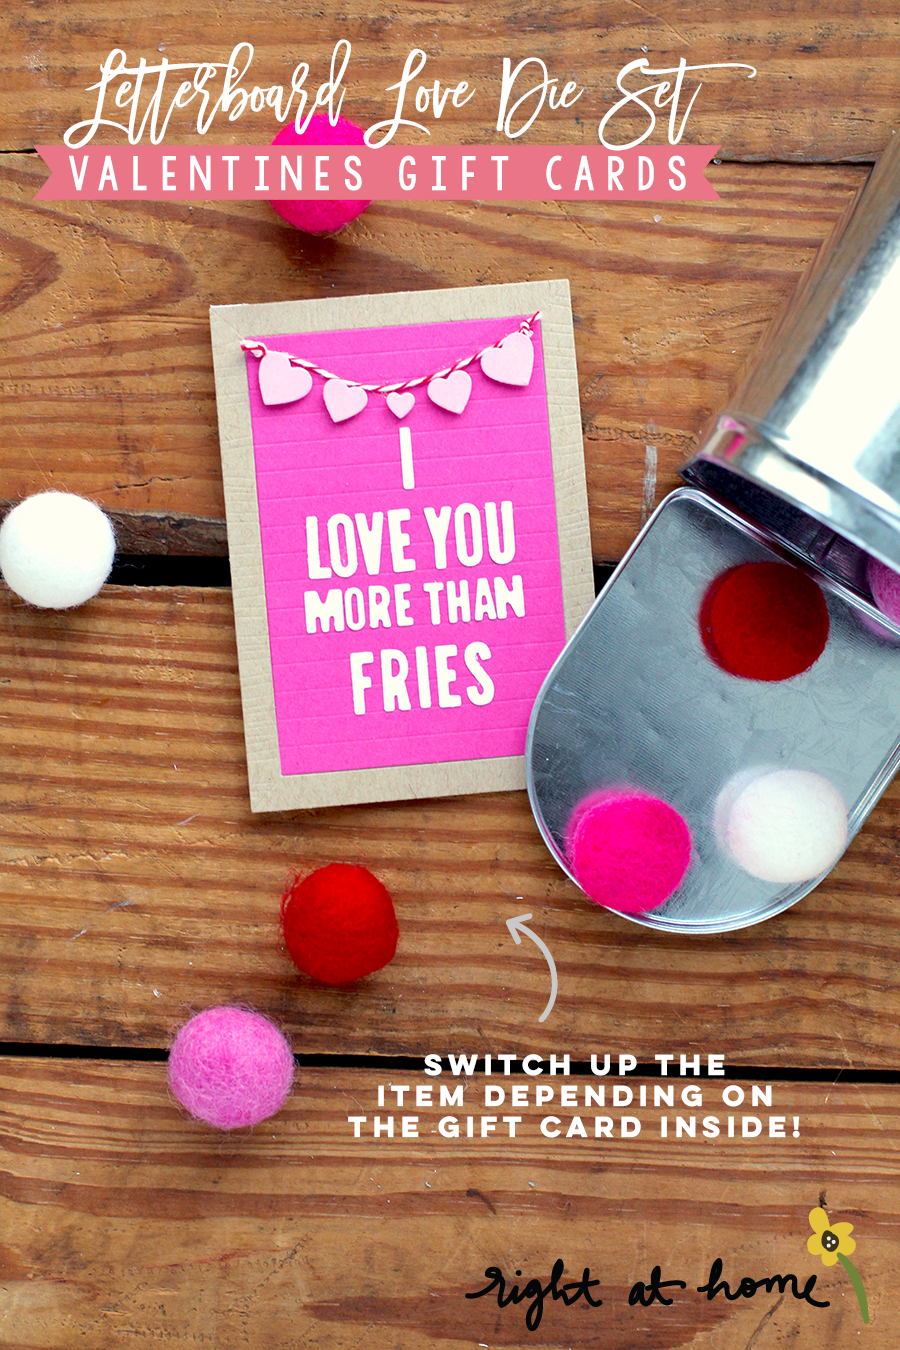 Letterboard Love Die Set Valentines Gift Cards // rightathomeshop.com/blog